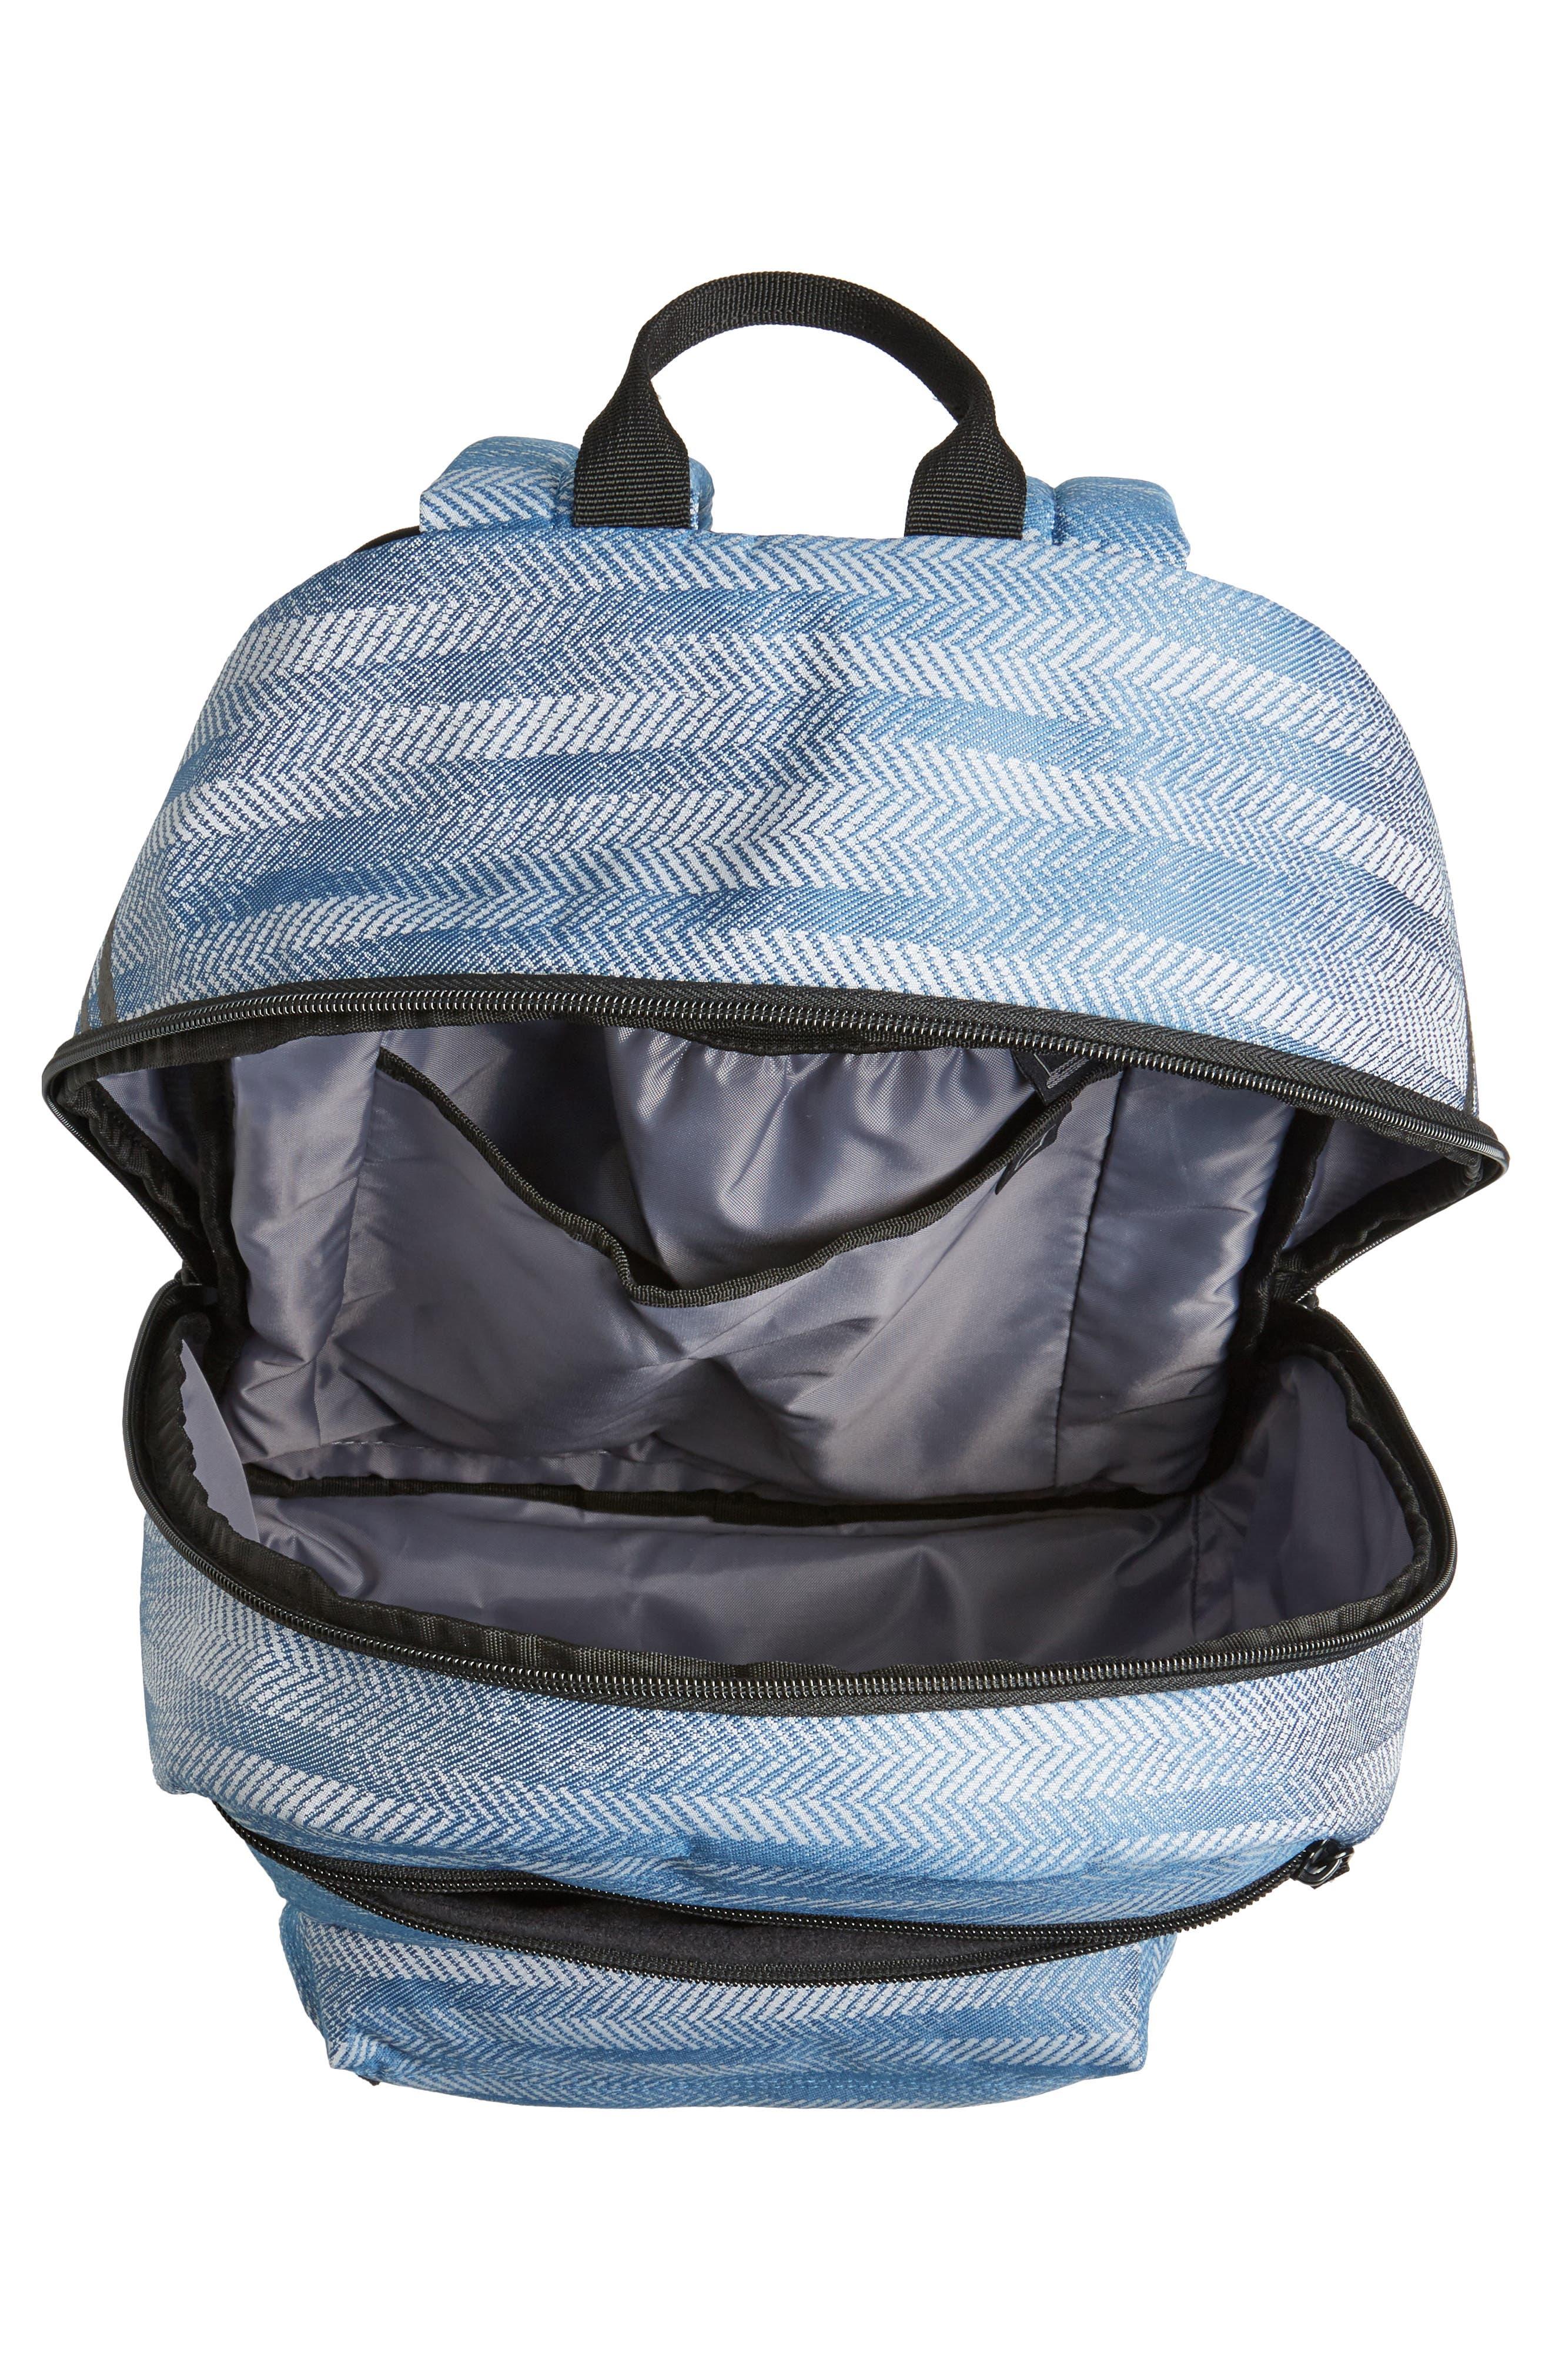 NTL Plus Backpack,                             Alternate thumbnail 4, color,                             CORE BLUE/ BLACK